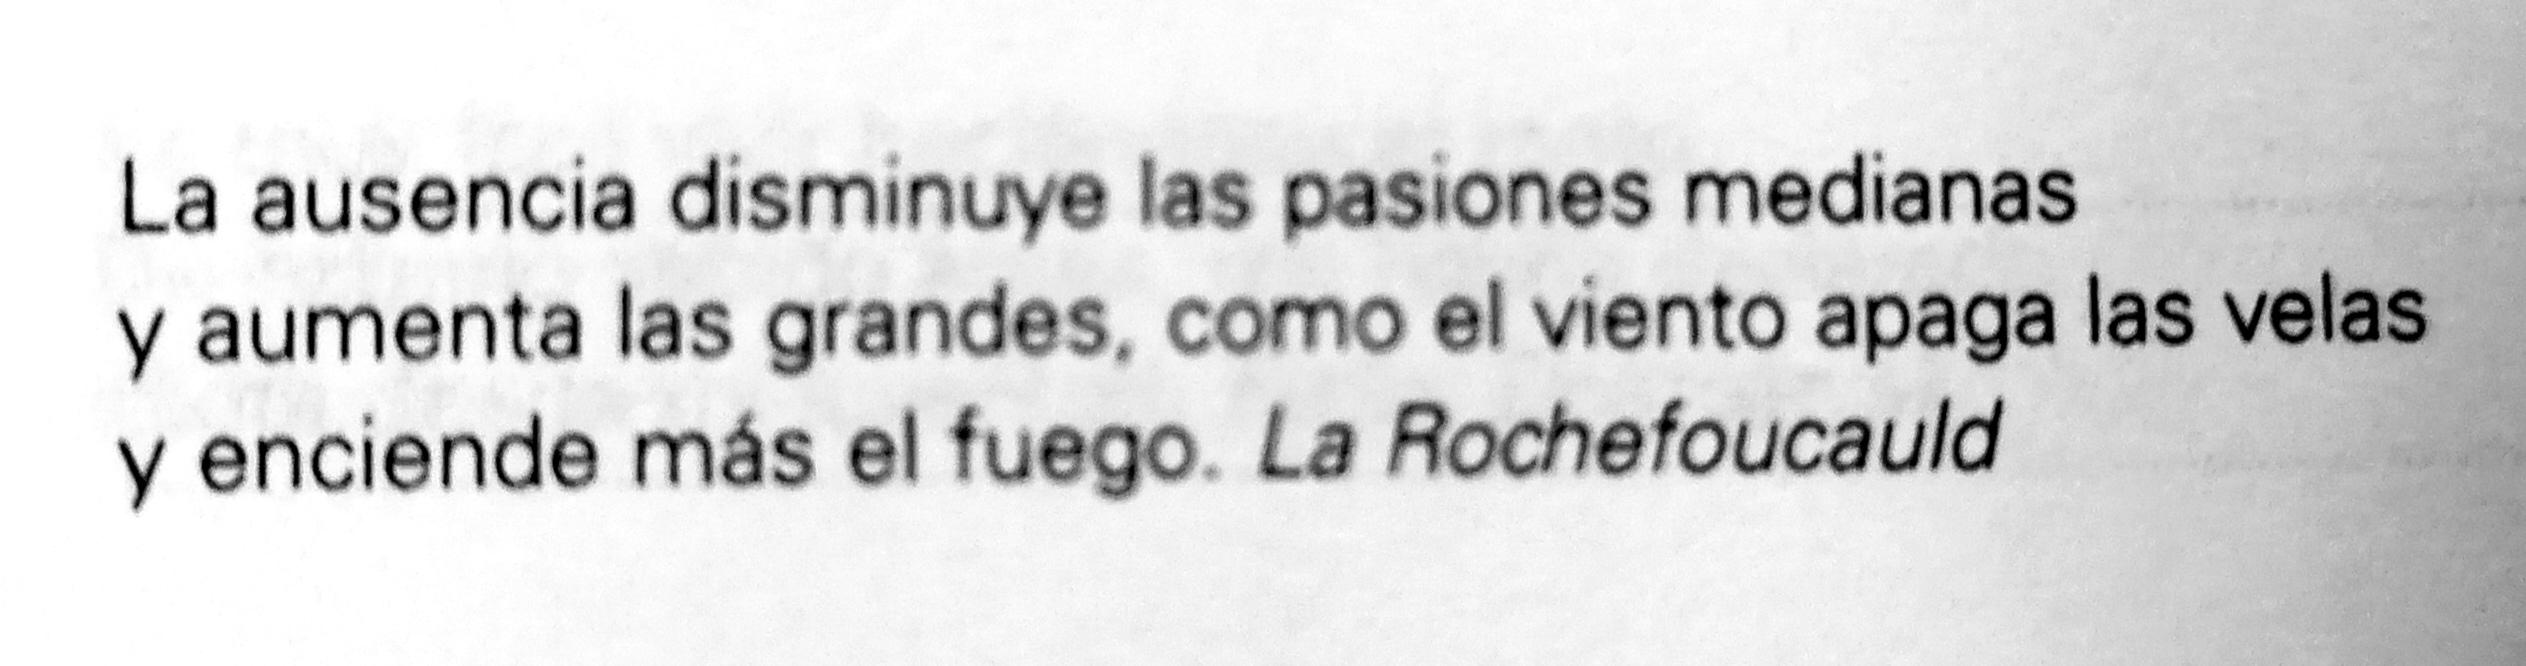 Frase de La Rochefoucauld